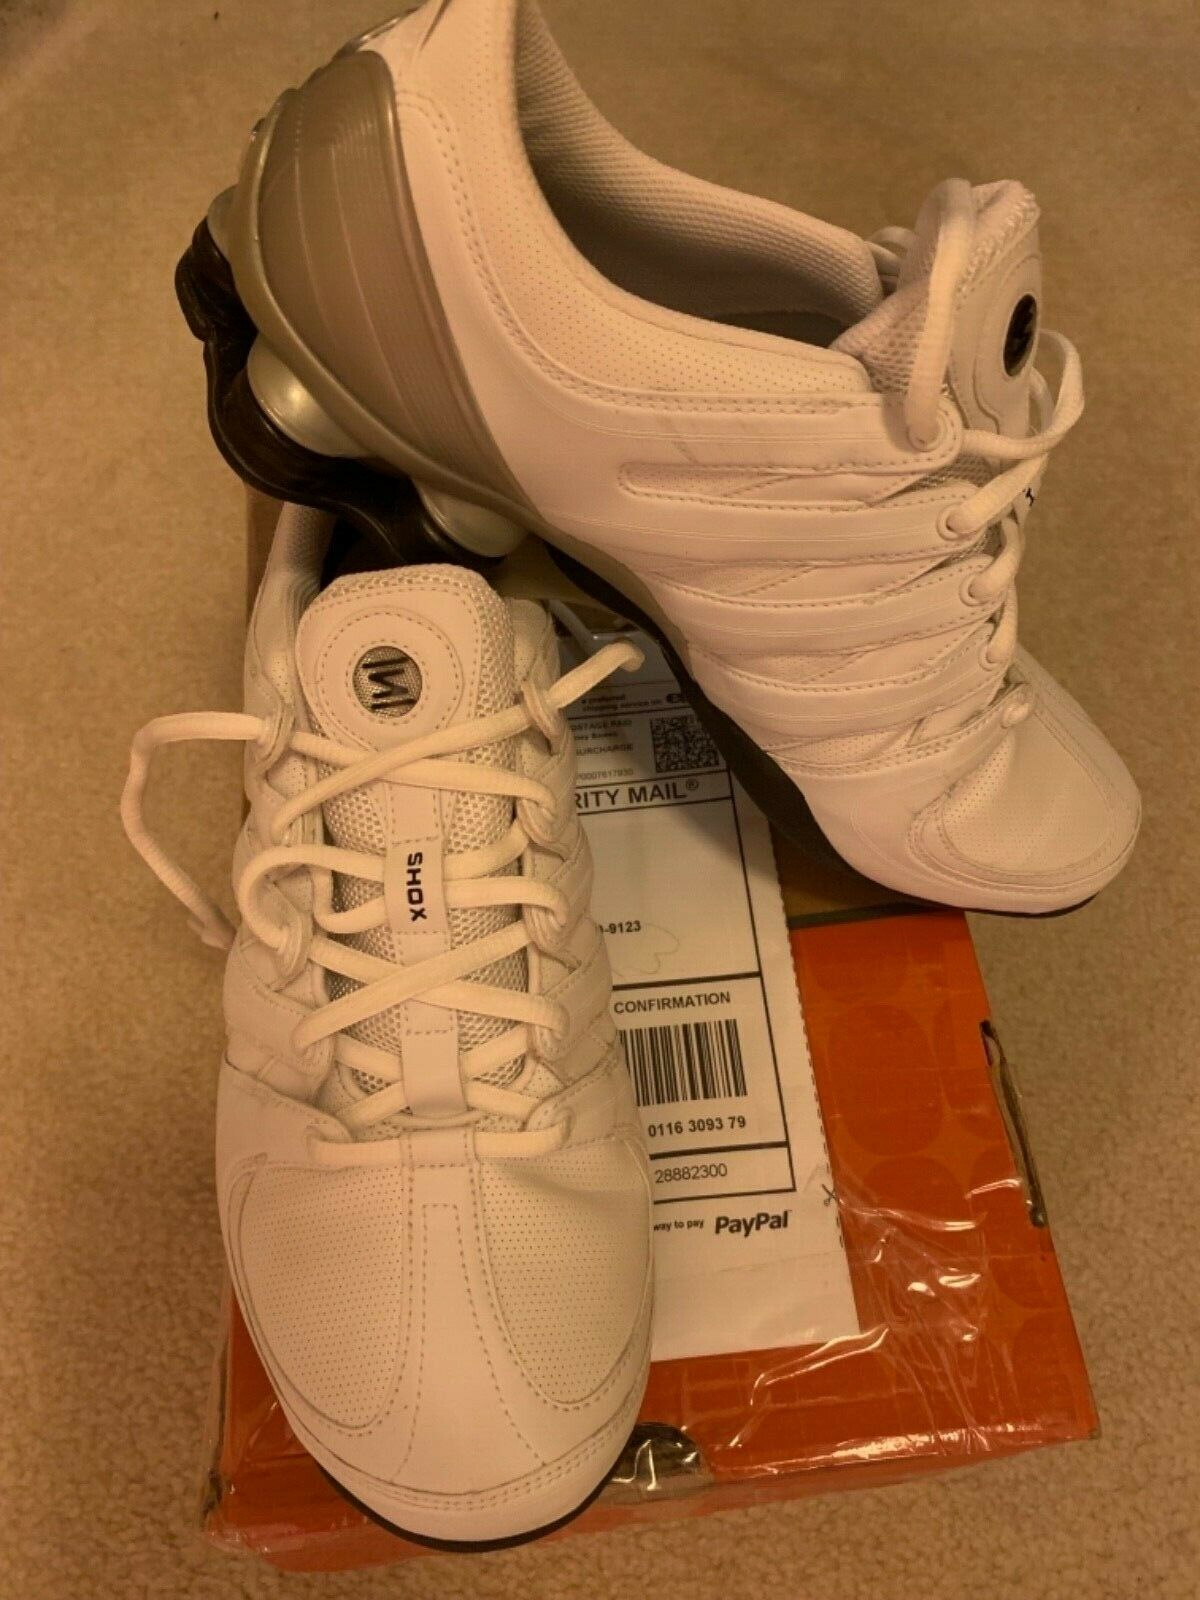 Nike Nike Nike Shox MC vit  Blk  Metallic silver Storlek 10B springaning skor 313764102  exportutlopp